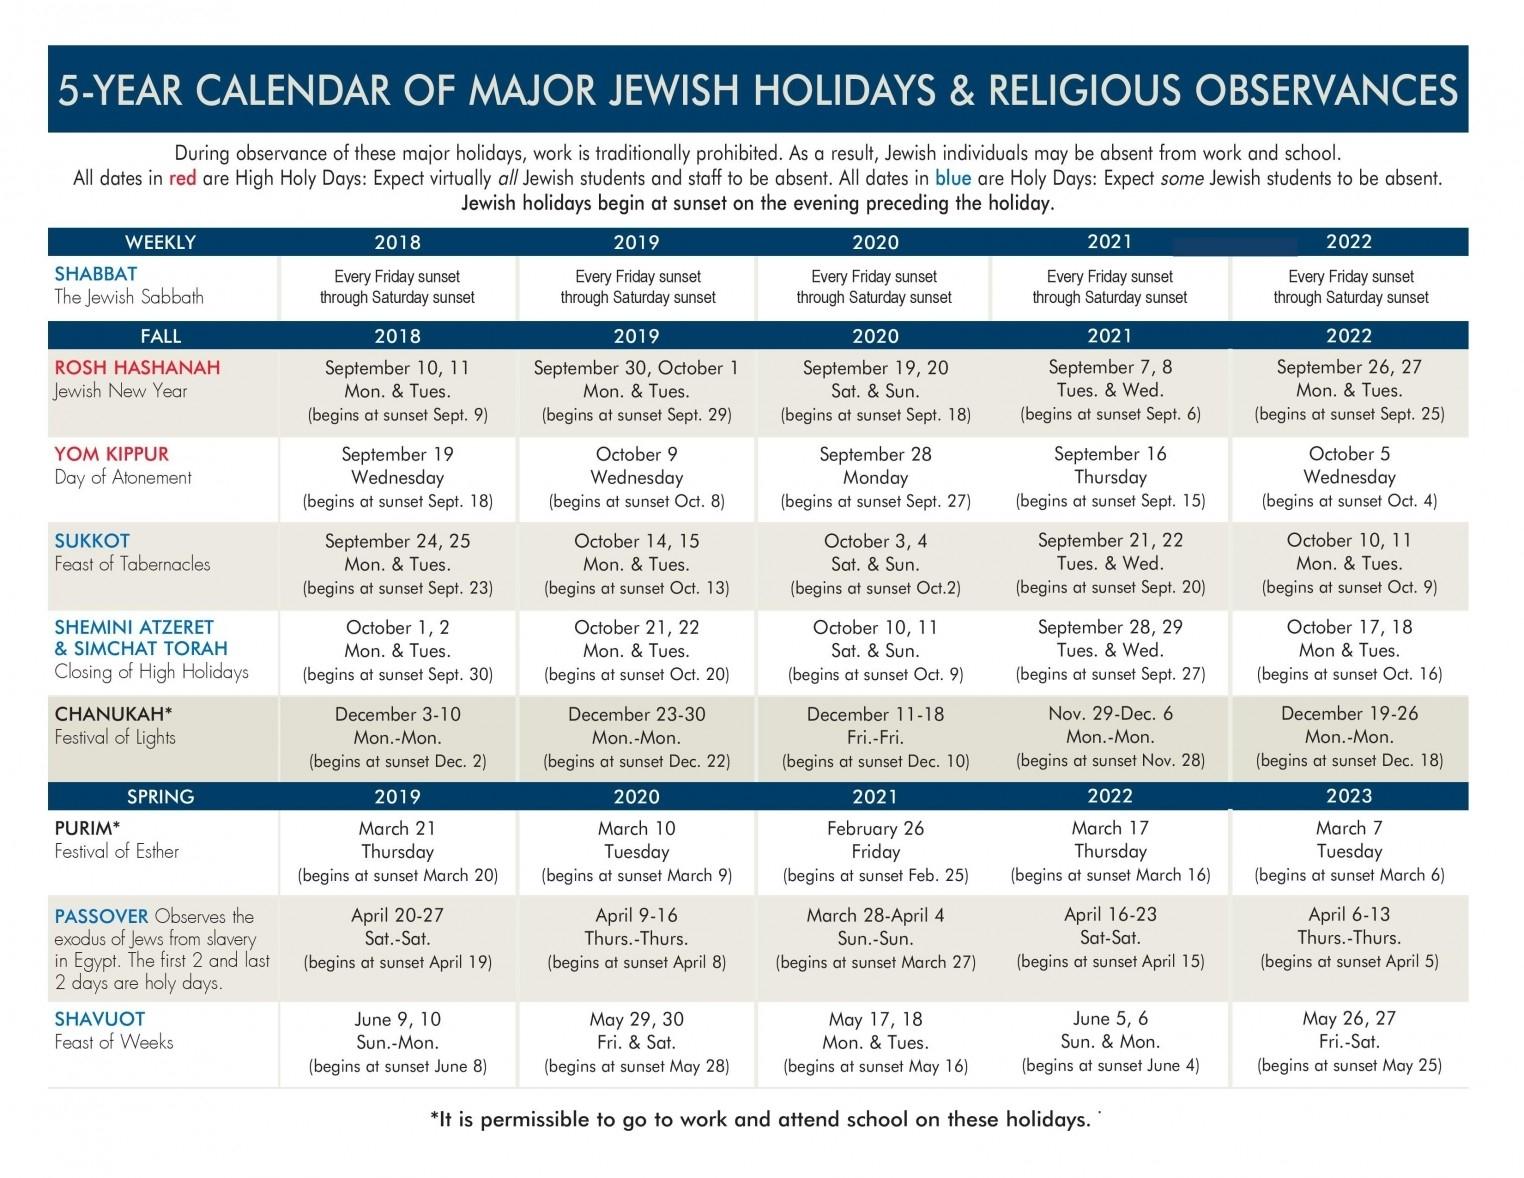 5-Year Jewish Holiday Calendar | Jewish Federation Of